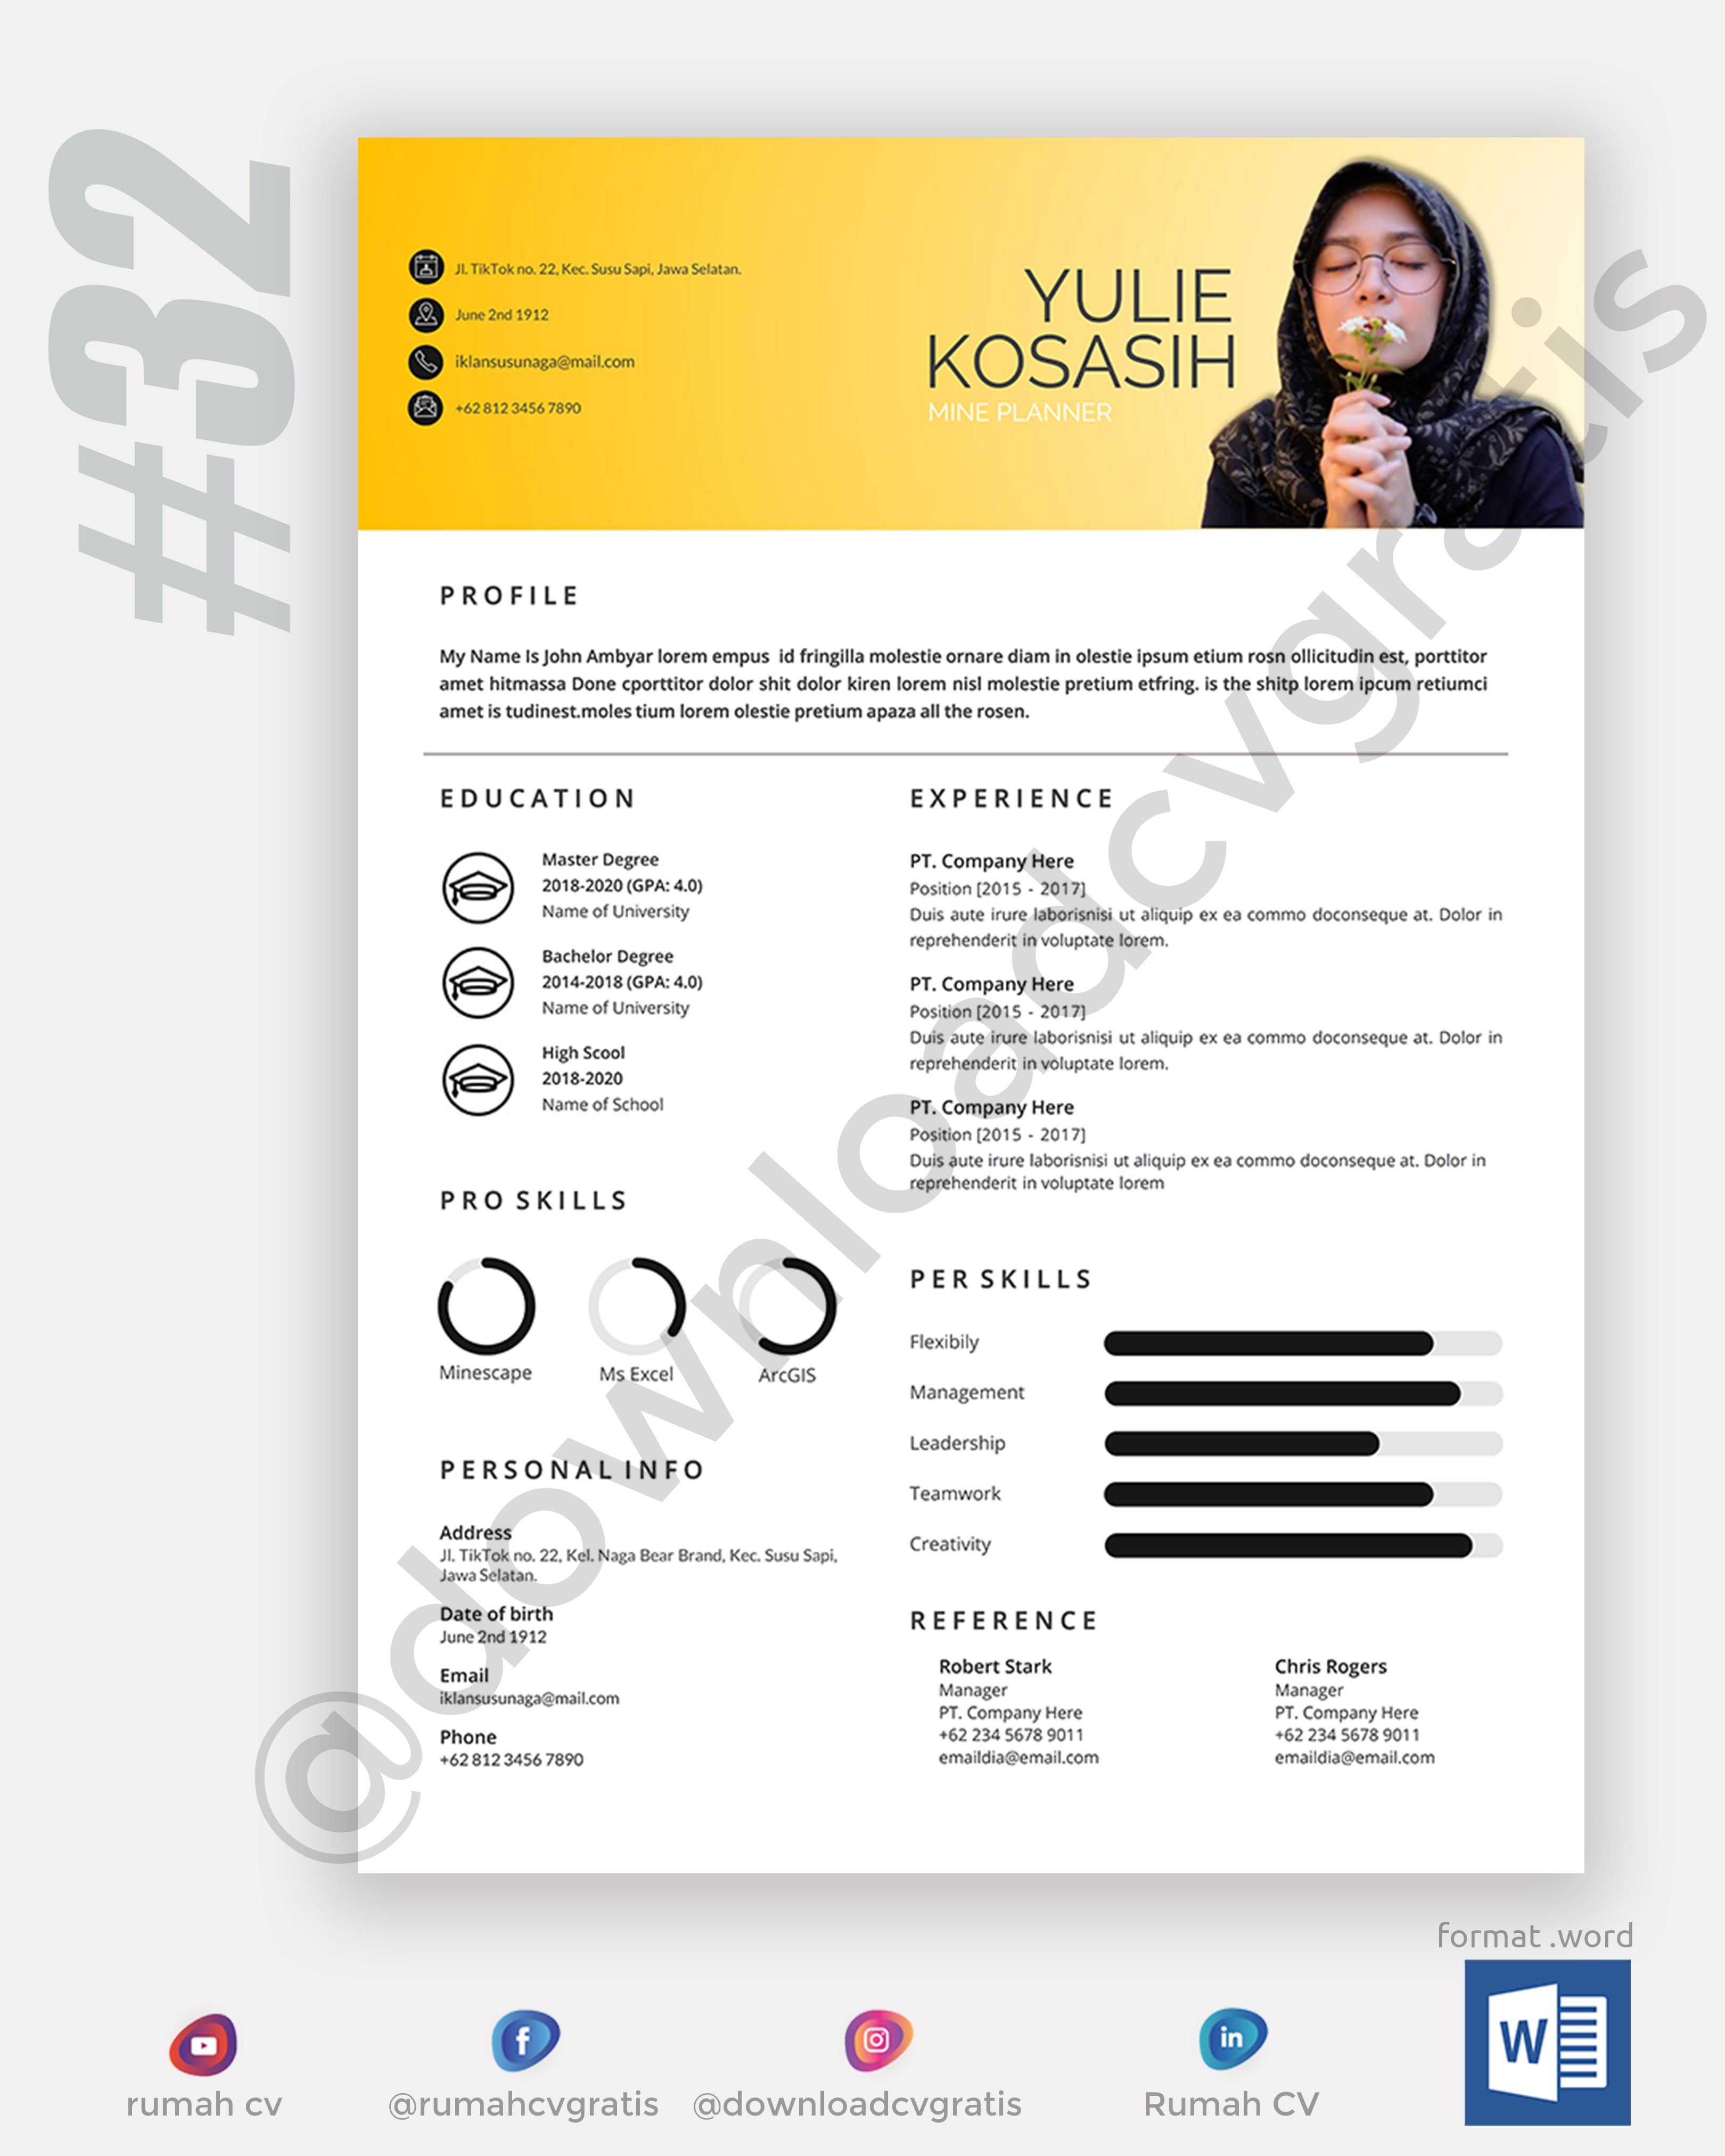 Contoh Cv Lamaran Kerja 32 Curriculum Vitae Examples Cv Examples Curriculum Vitae